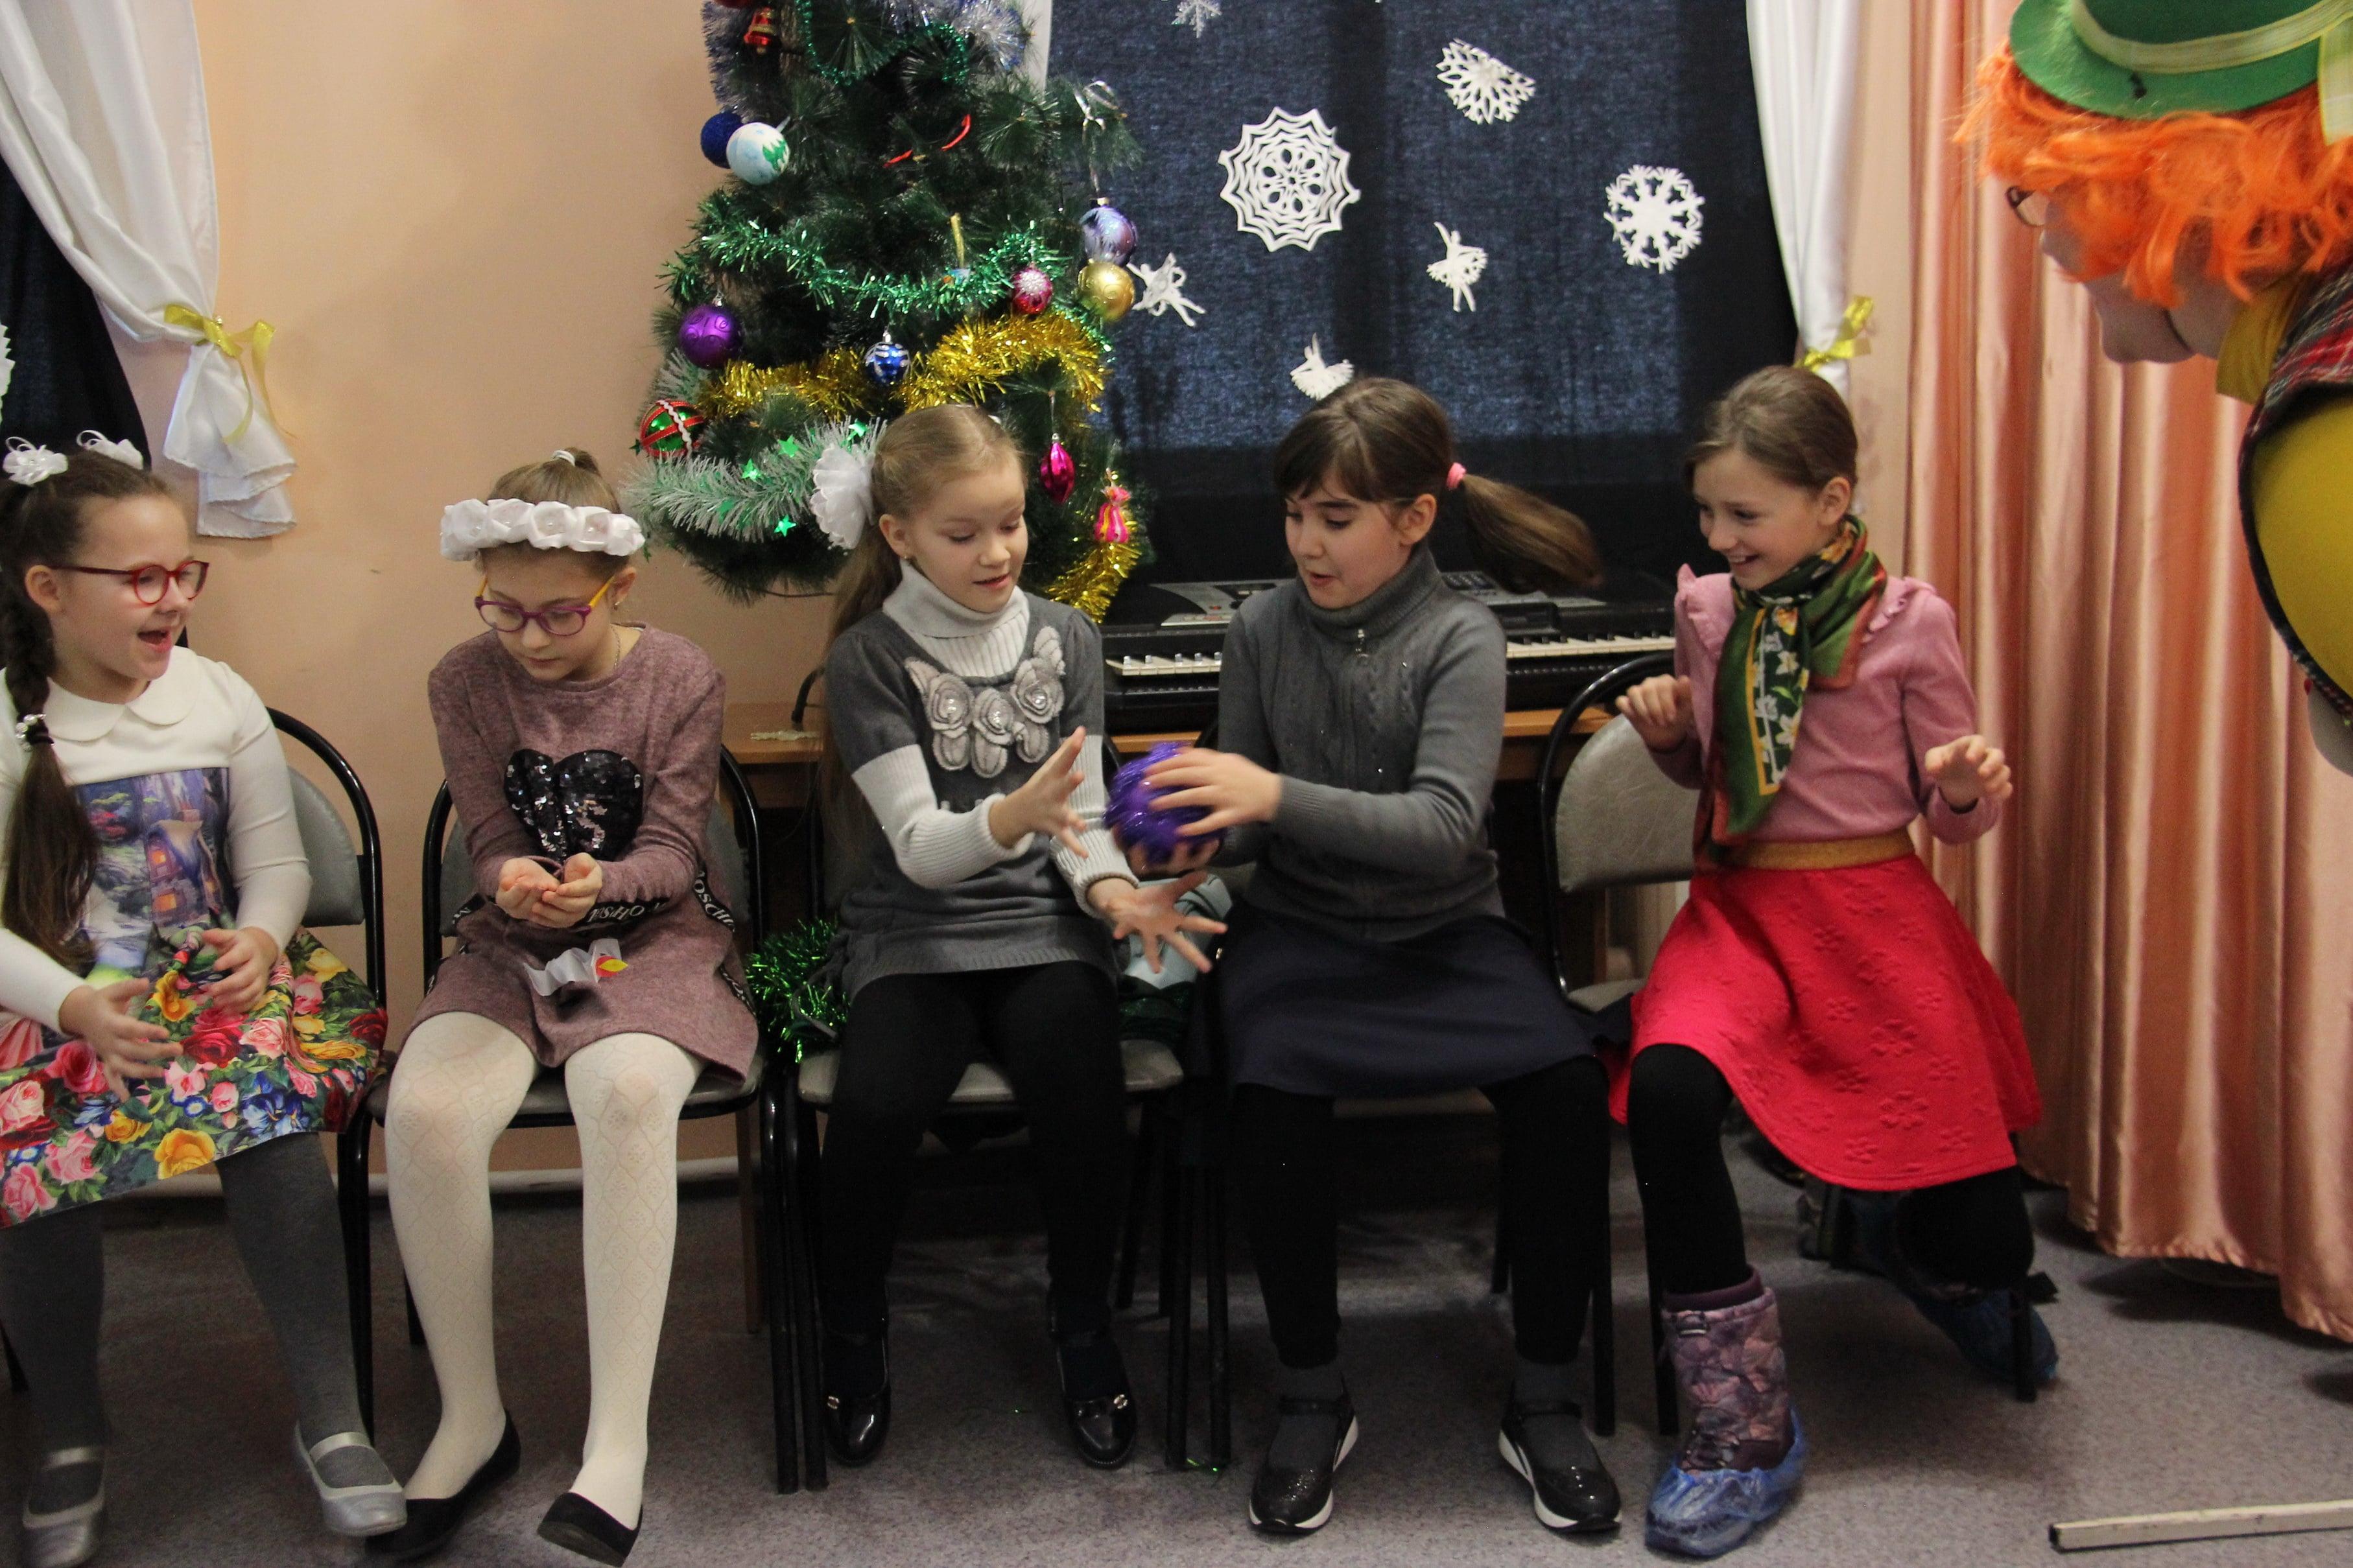 http://monuspen.ru/photoreports/2d5329c447a61fd0f910bf1d53ea8456.JPG